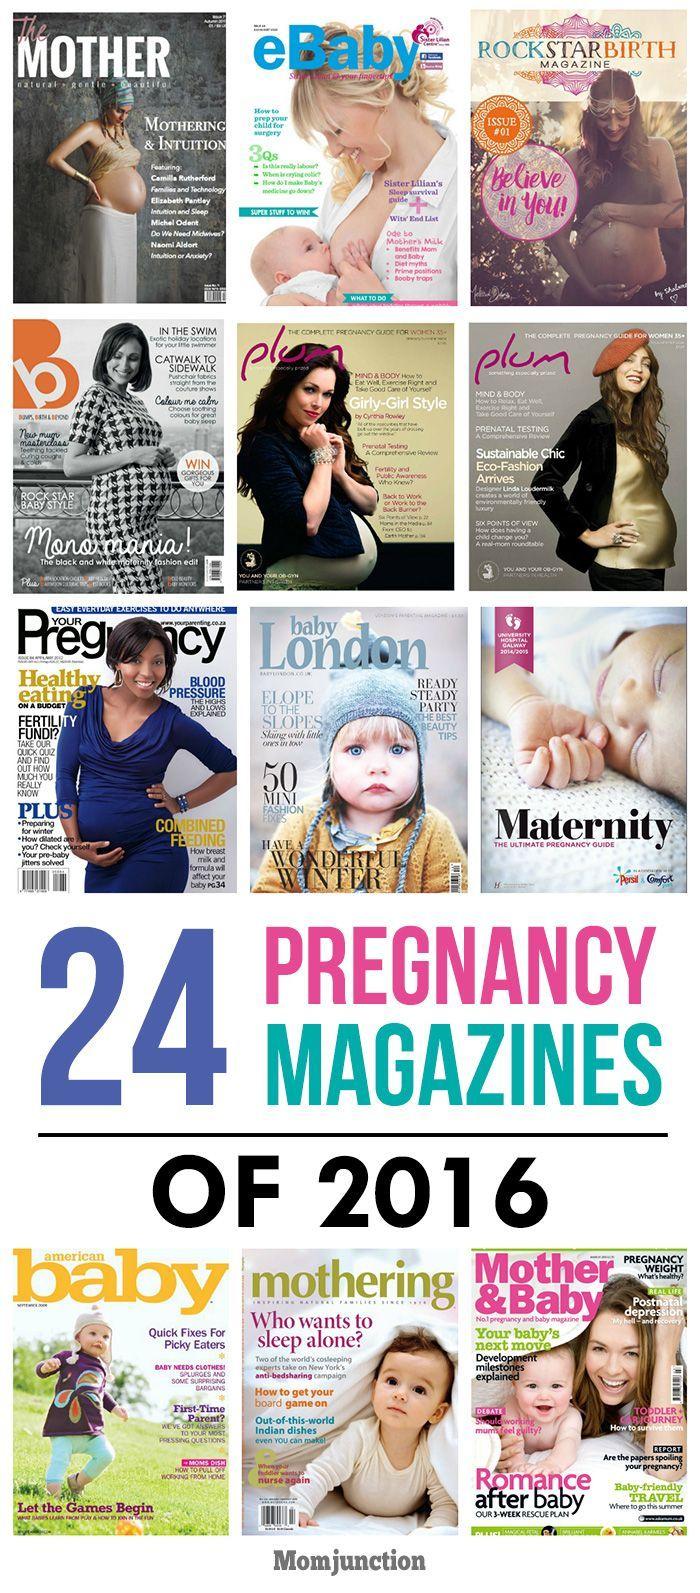 24 Best Pregnancy Magazines Of 2016